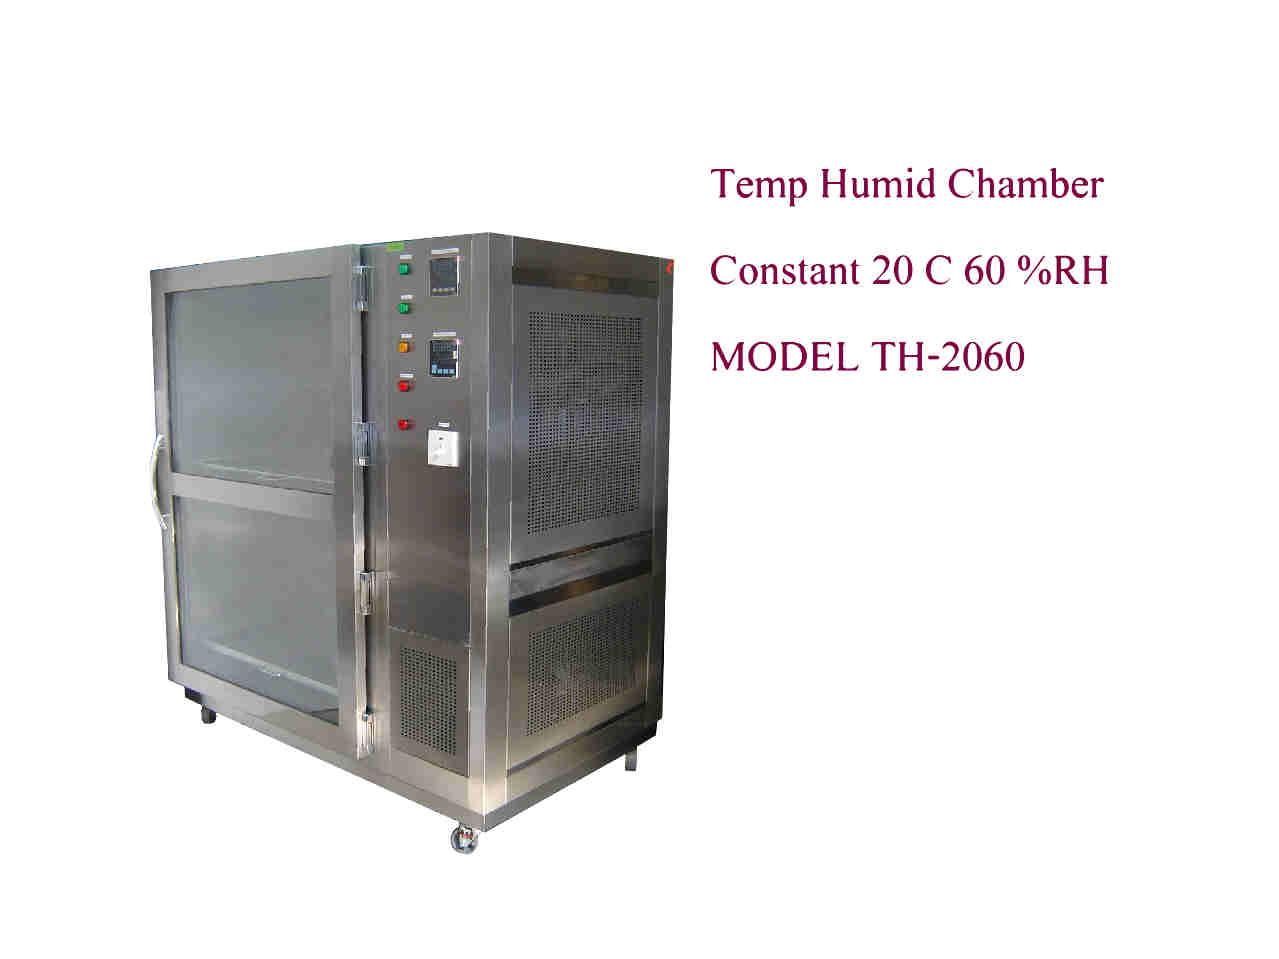 Temp-Humid Chamber ตู้ควบคุมความชื้น อุณหภูมิ  Diligent  TH-2350 ขนาด 750 ลิตร